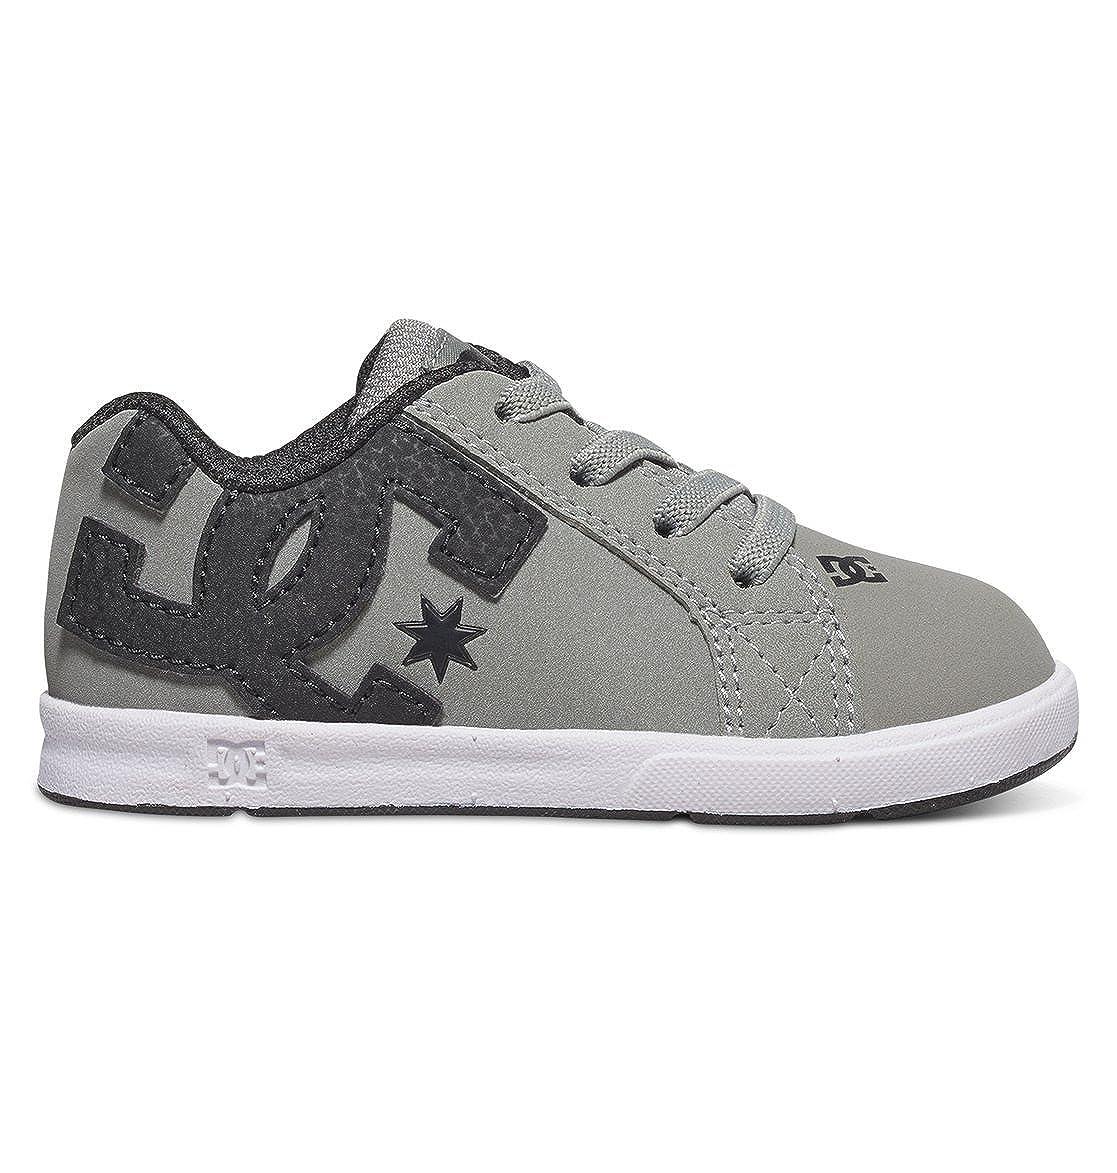 DC Court Graffik Elastic UL Skate Sneaker (Toddler) COURT GRAFFIK ELASTIC UL - K